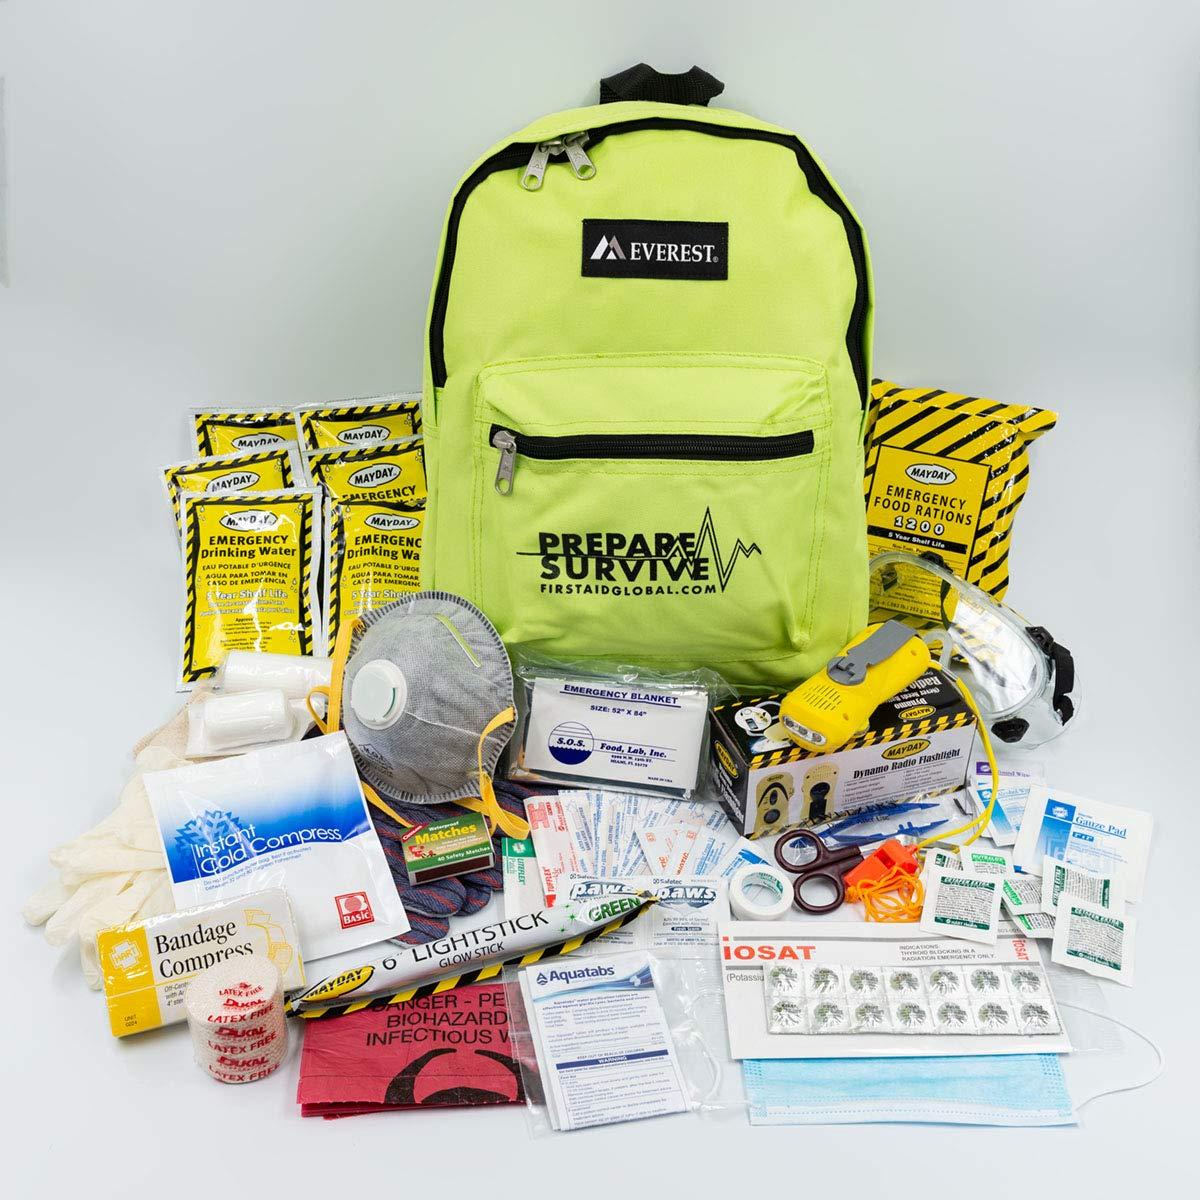 PrepareSurvive Backpack for Disaster Preparedness with Dynamo Radio/Flashlight & iOSAT KI Tablets by PrepareSurvive